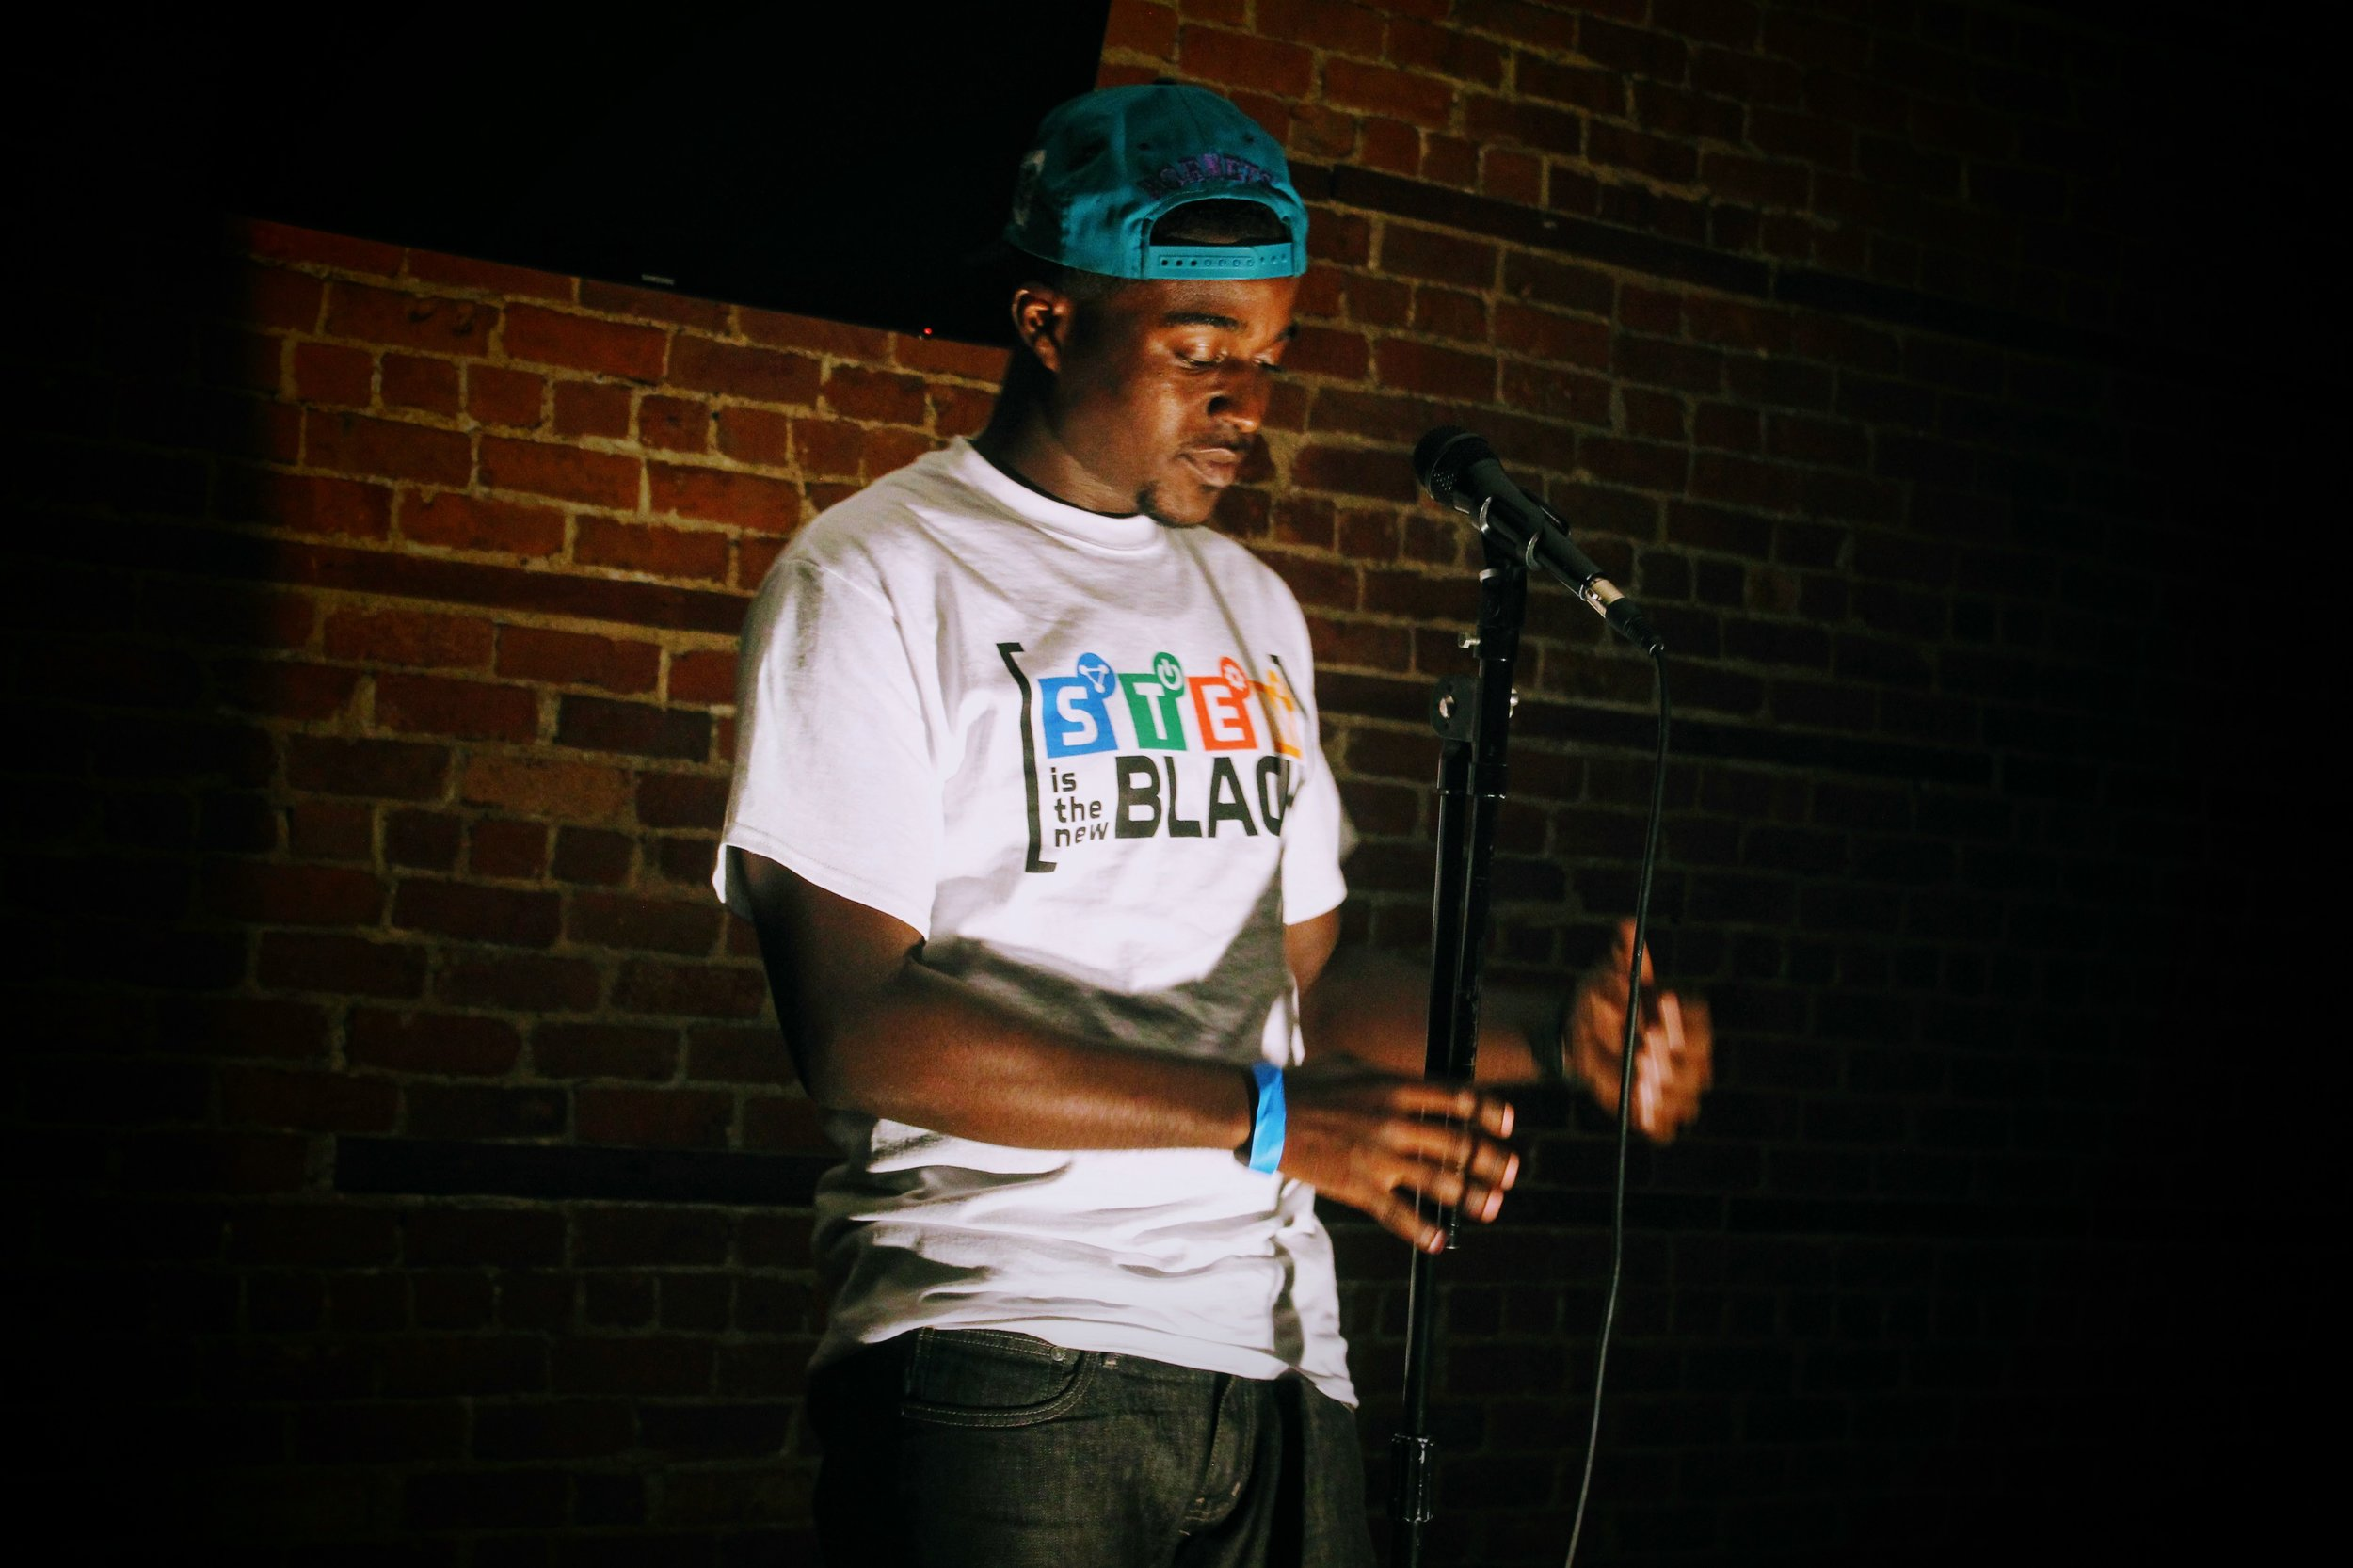 STEM Is The New Black x They Say Open Mic Night (Detroit, MI)